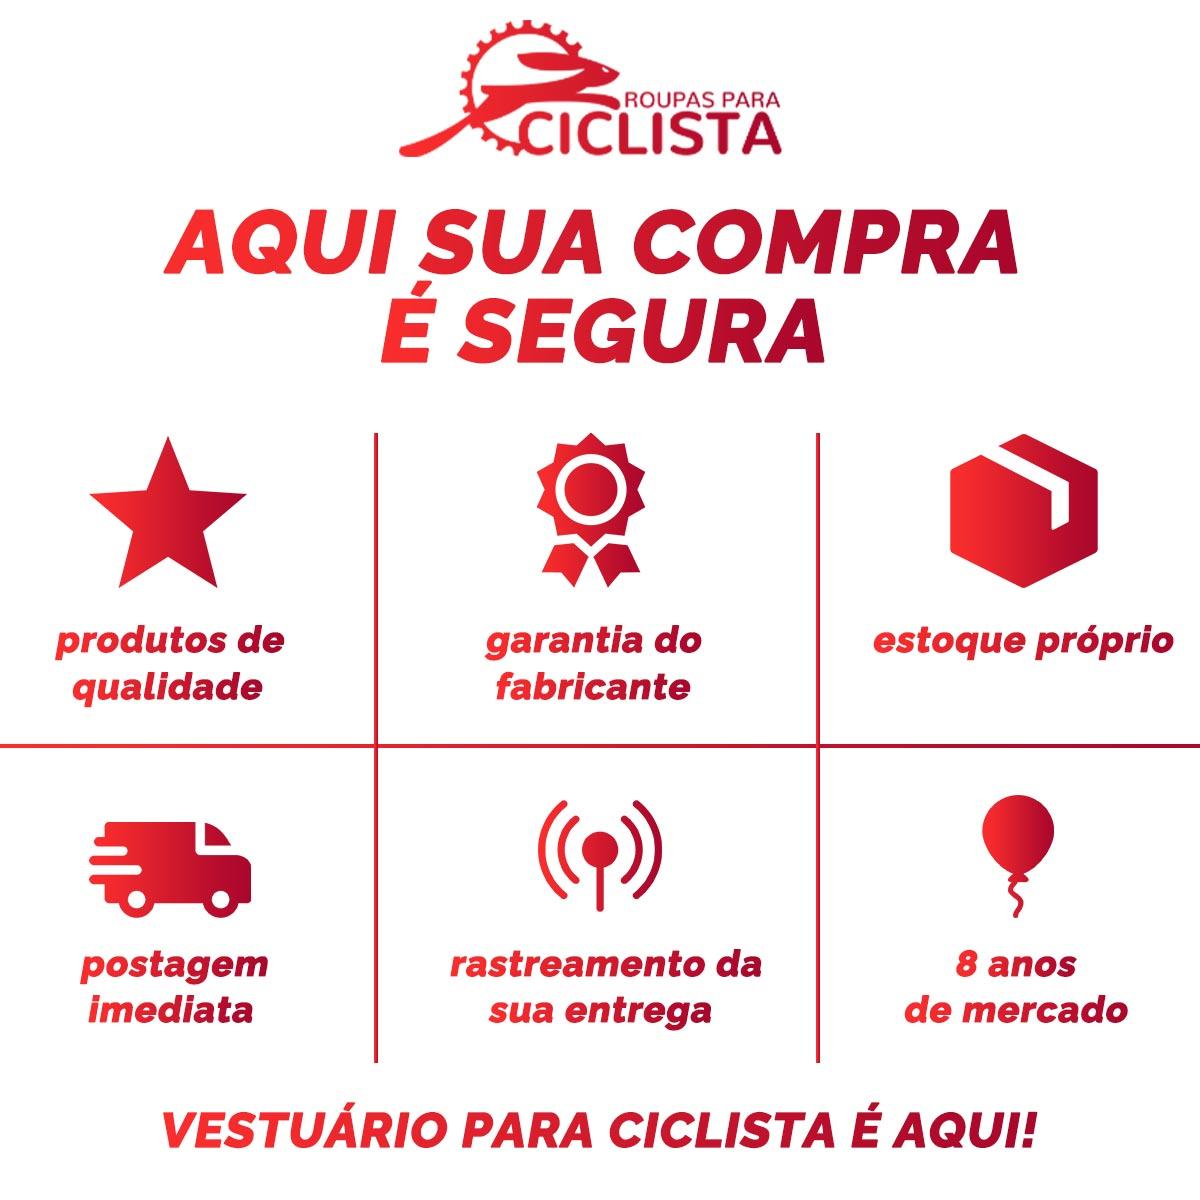 CALCA BRETELLE FLETS MASCULINA BASIC COMPRESSION PRETO COM F ESTANHO NEW CICLISMO